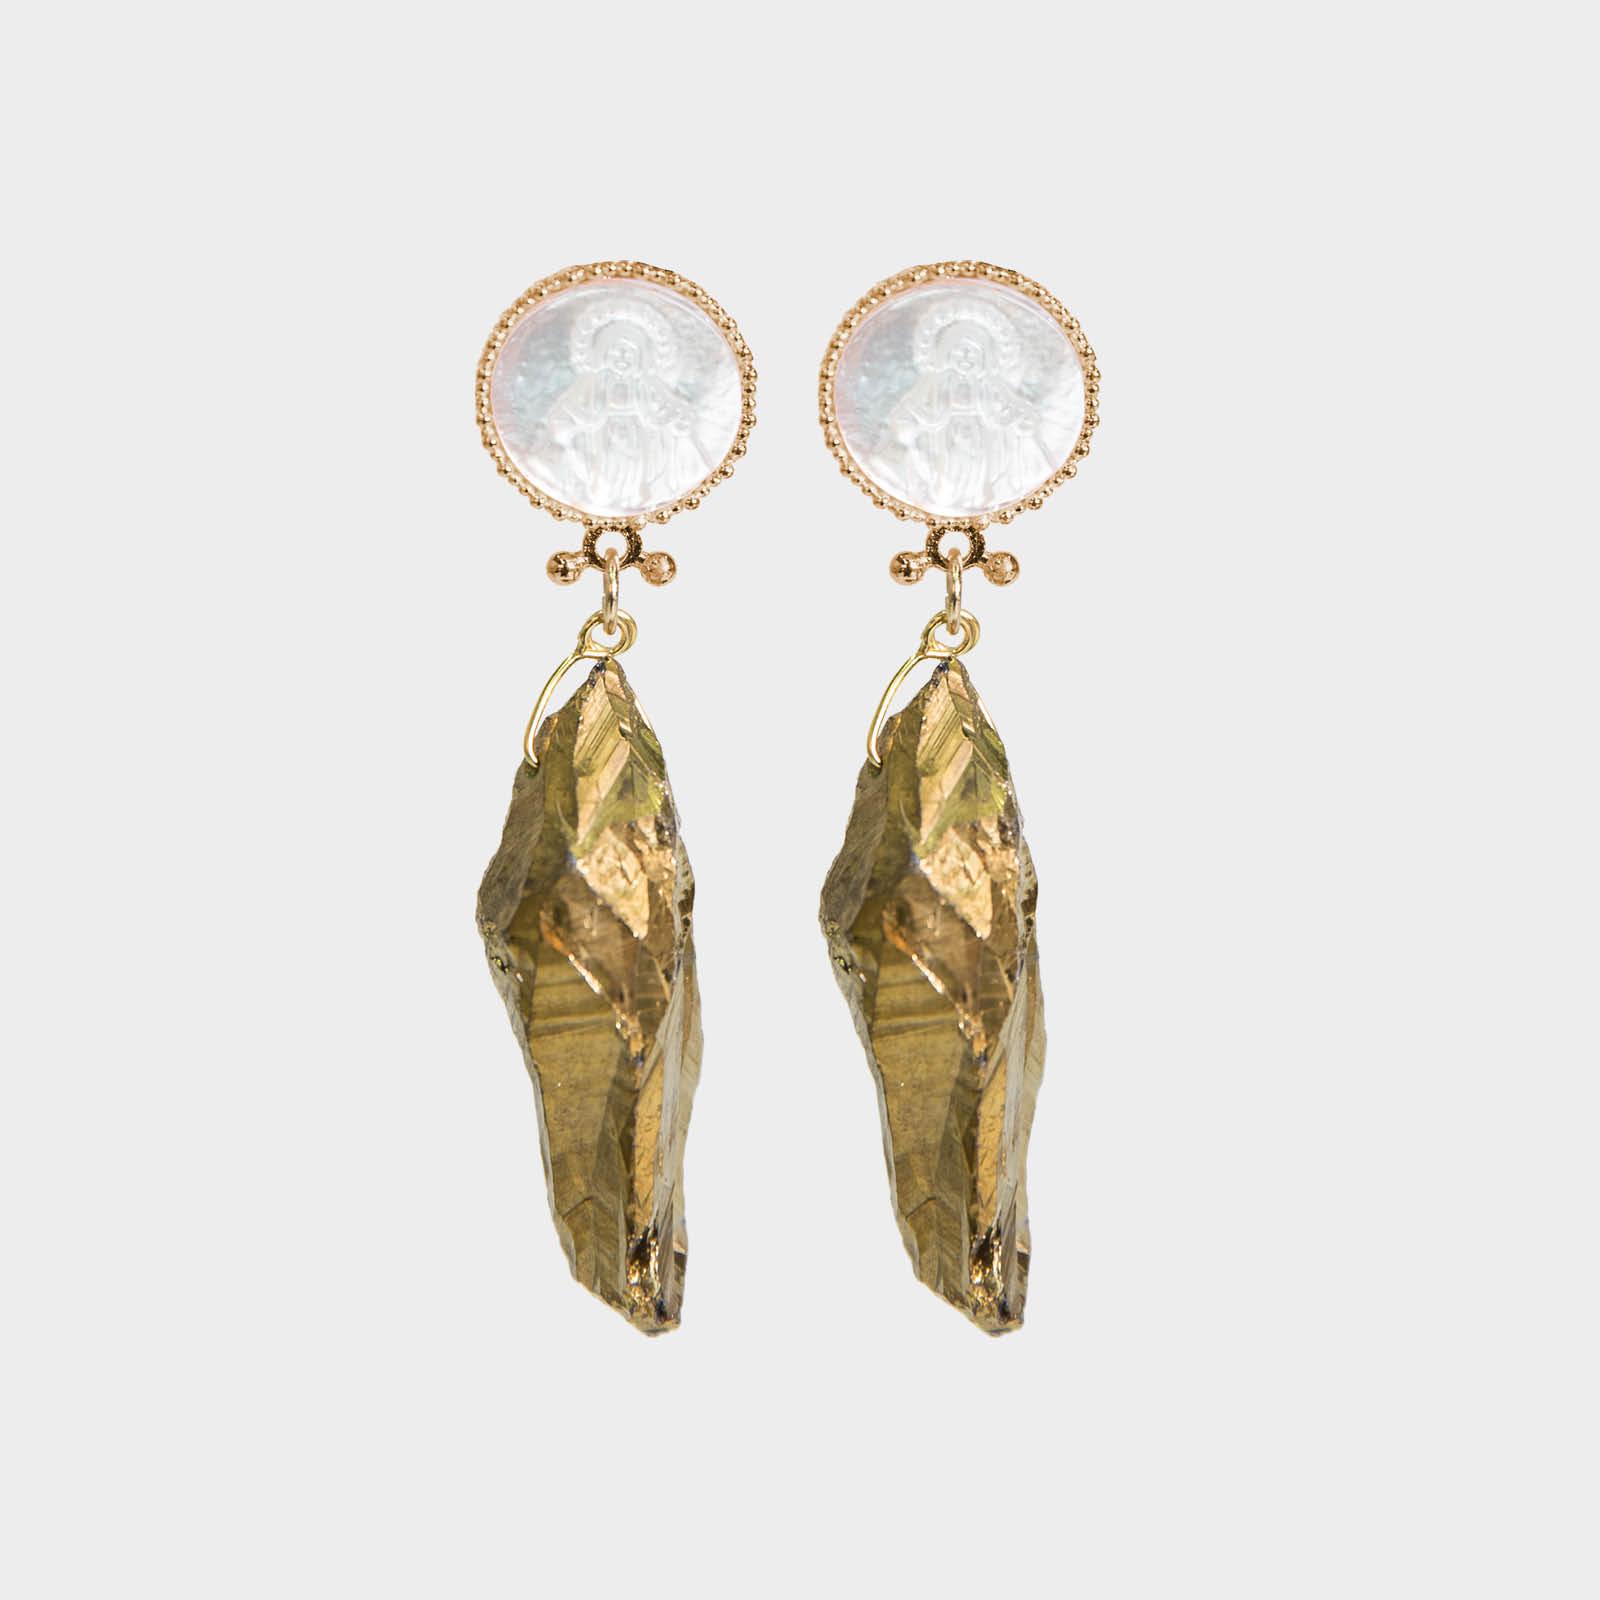 Maria Agate Earrings